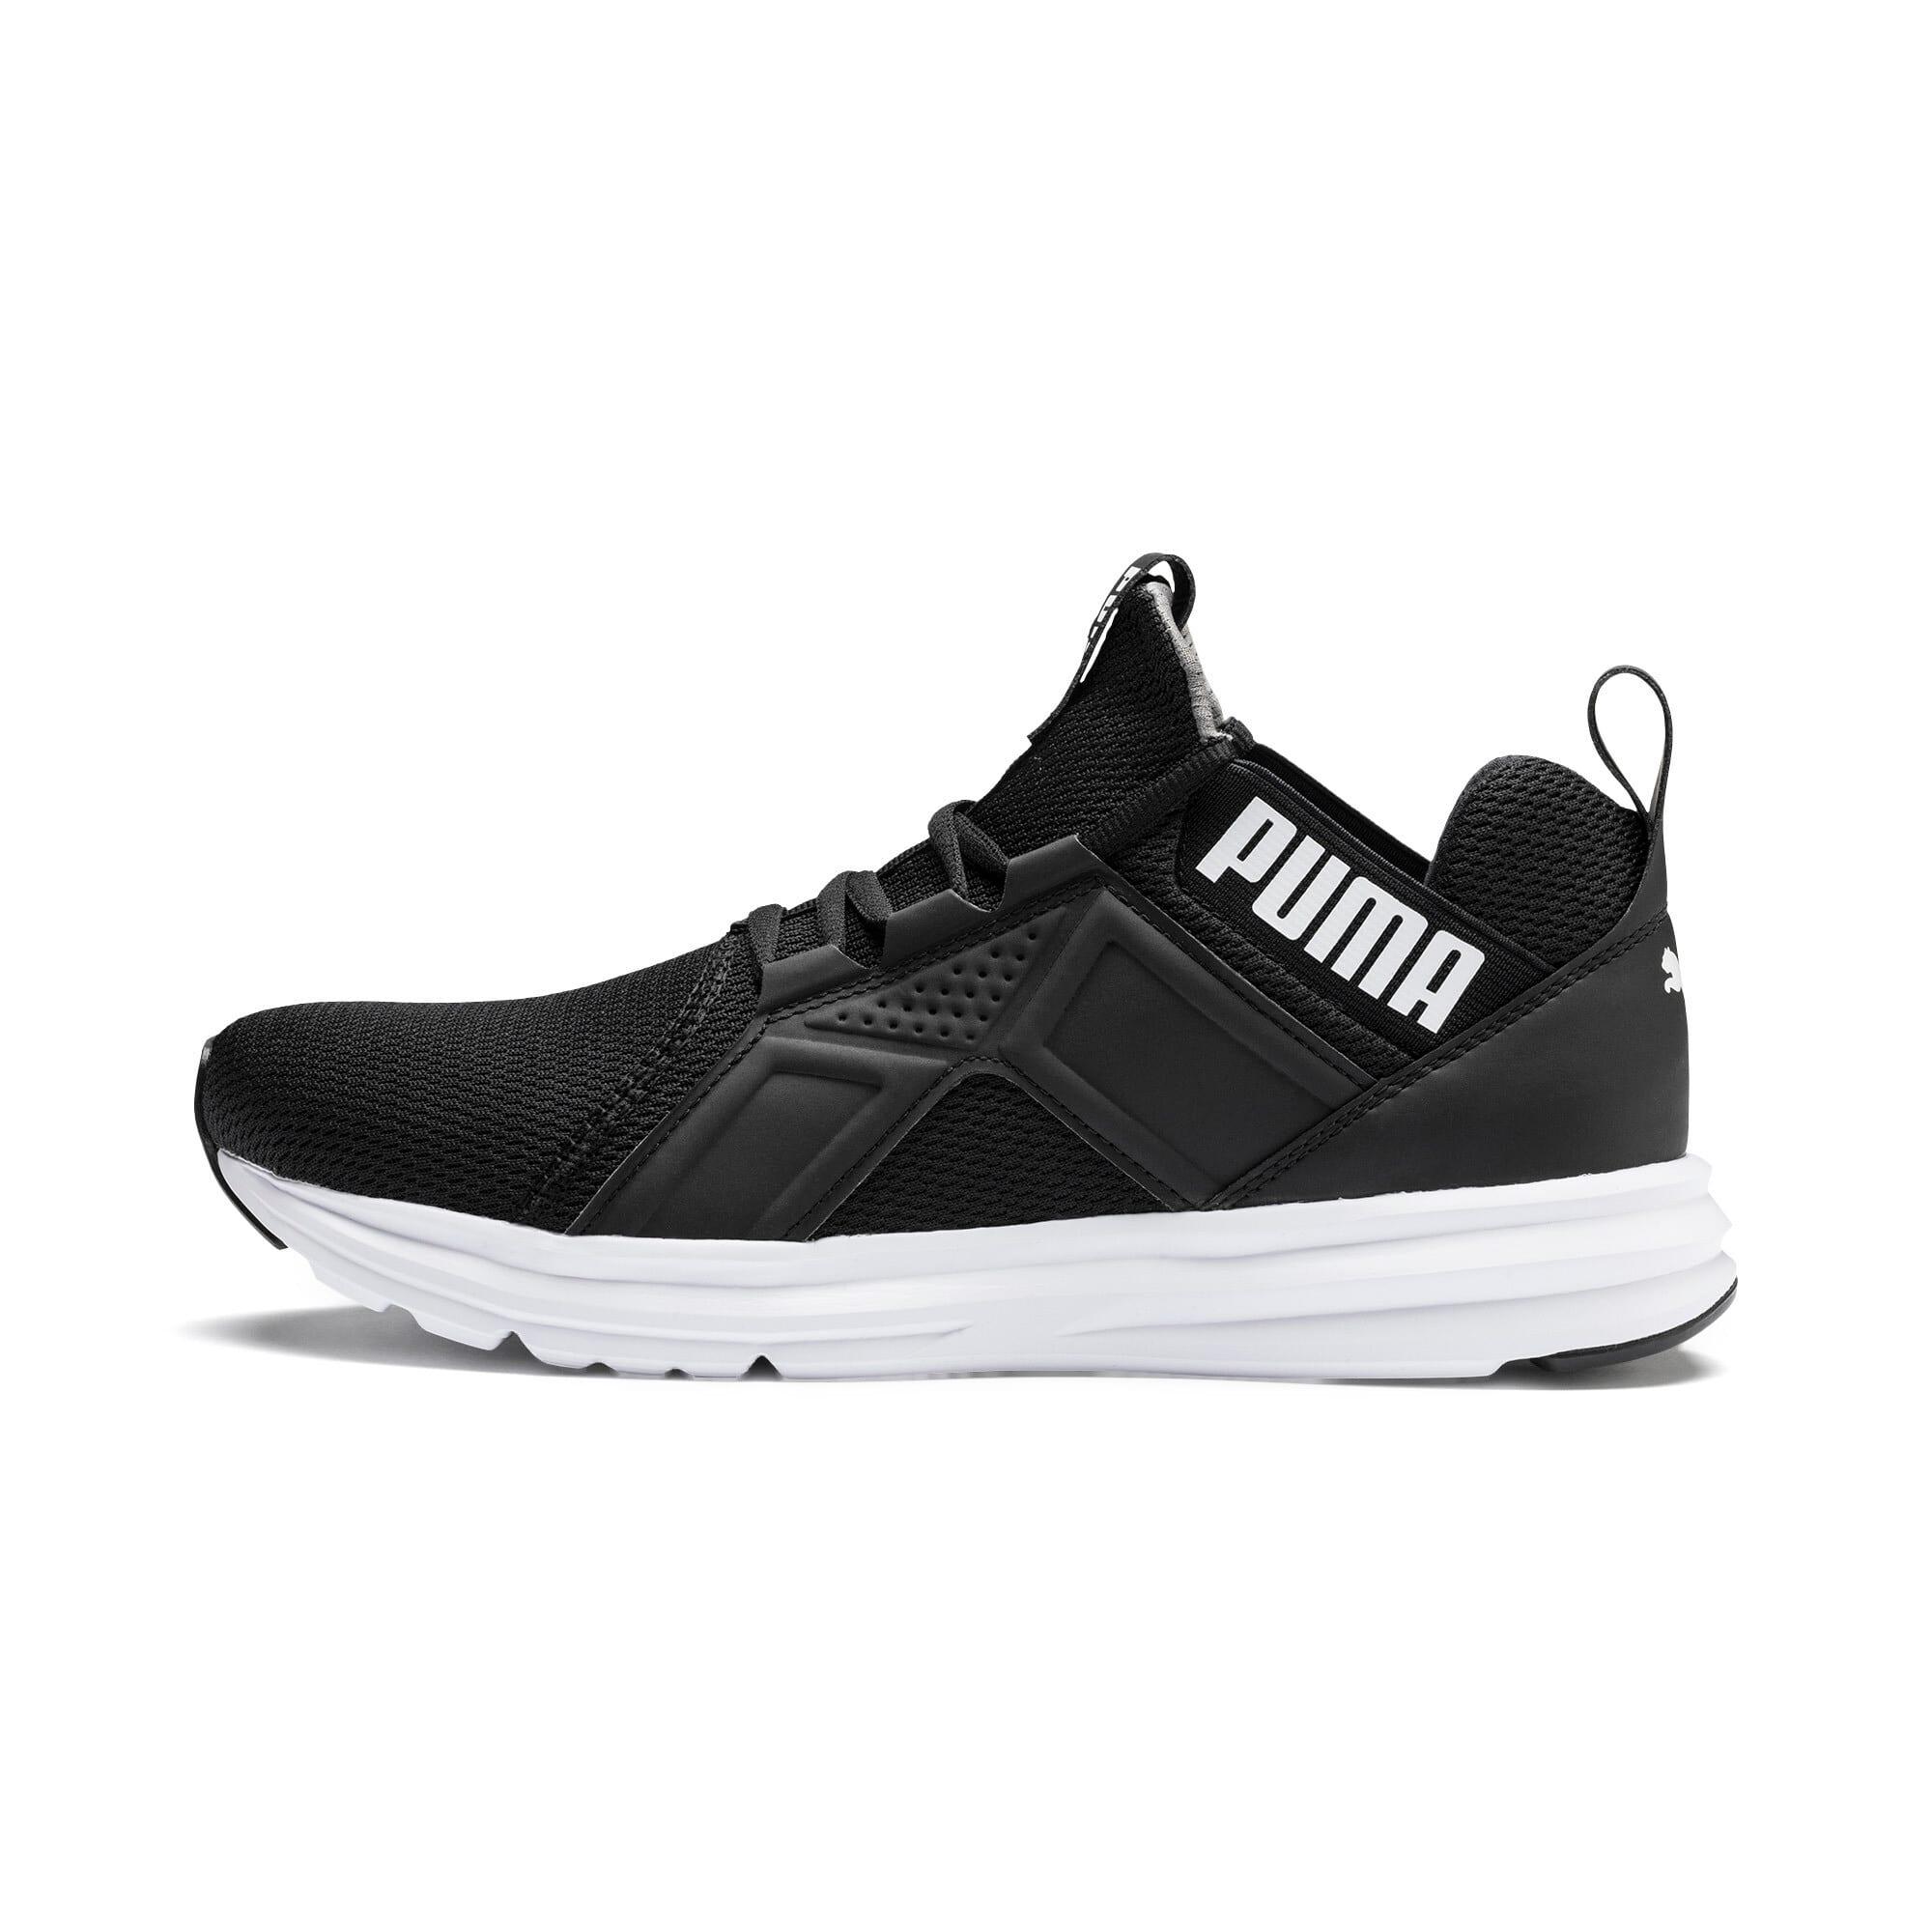 Thumbnail 1 of Enzo Sport Herren Sneaker, Puma Black-Puma White, medium